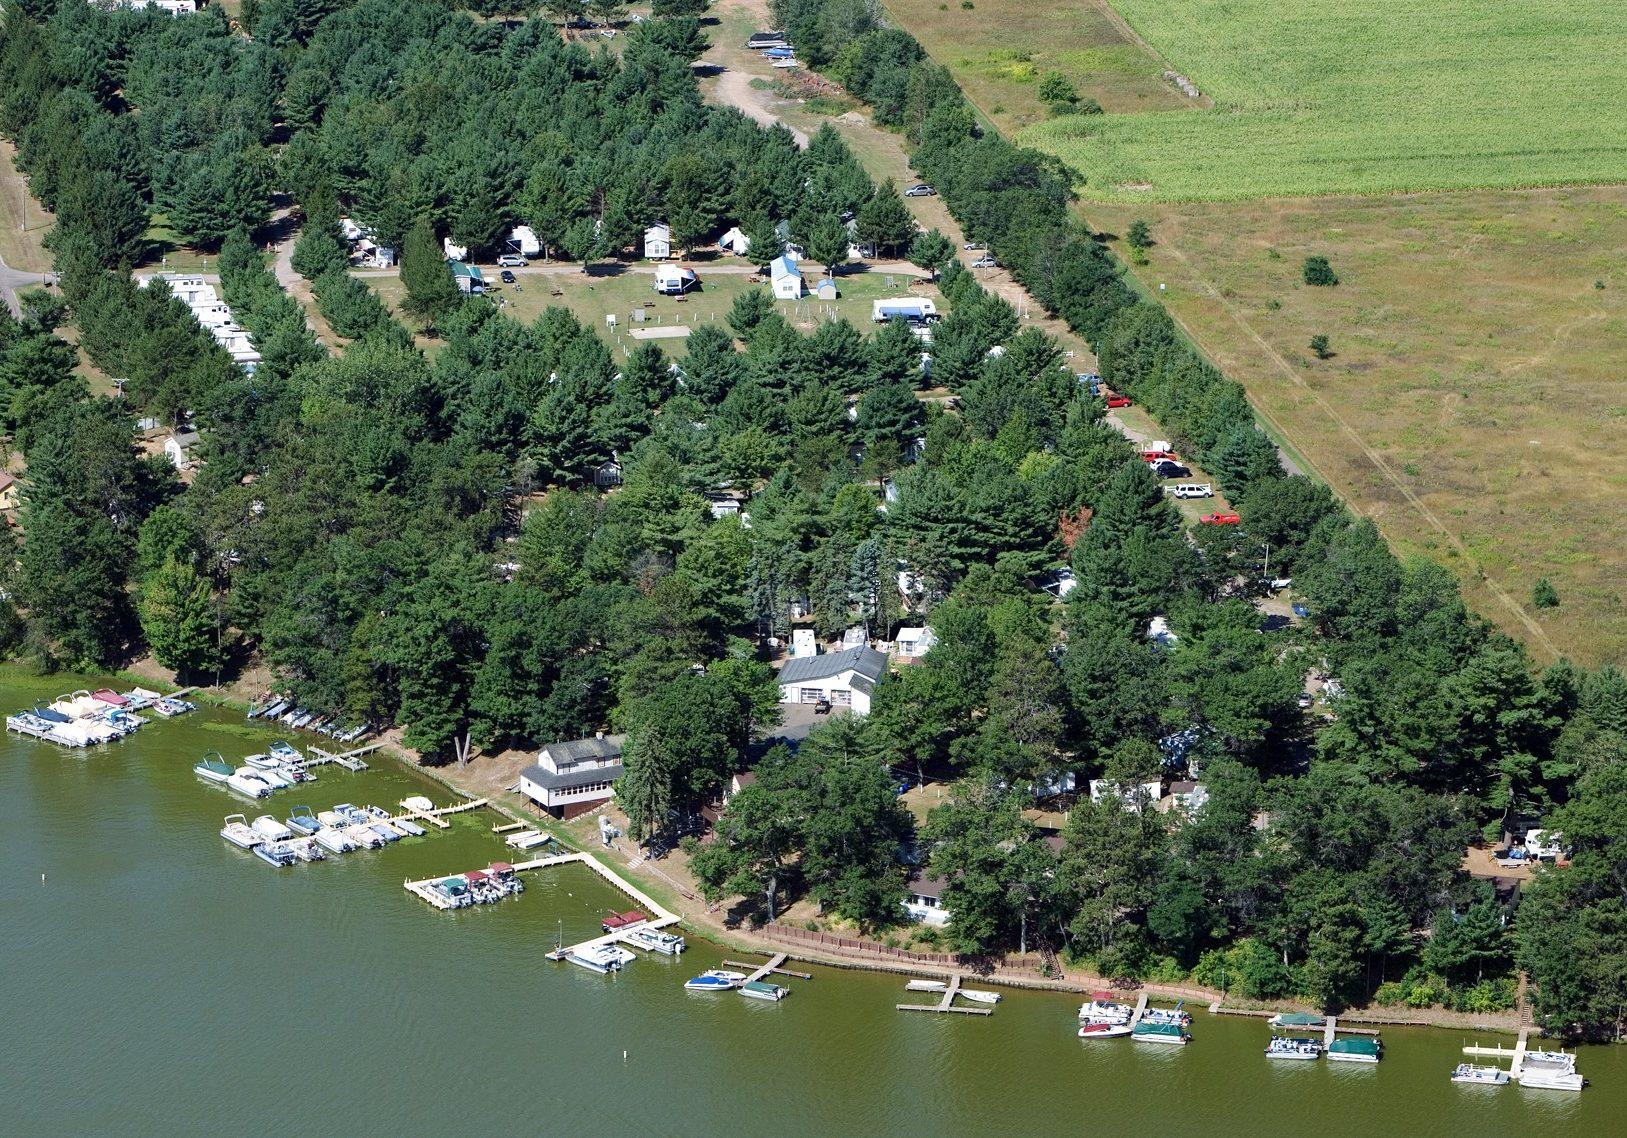 Six Lakes Resort and RV Park – Wonderful family friendly